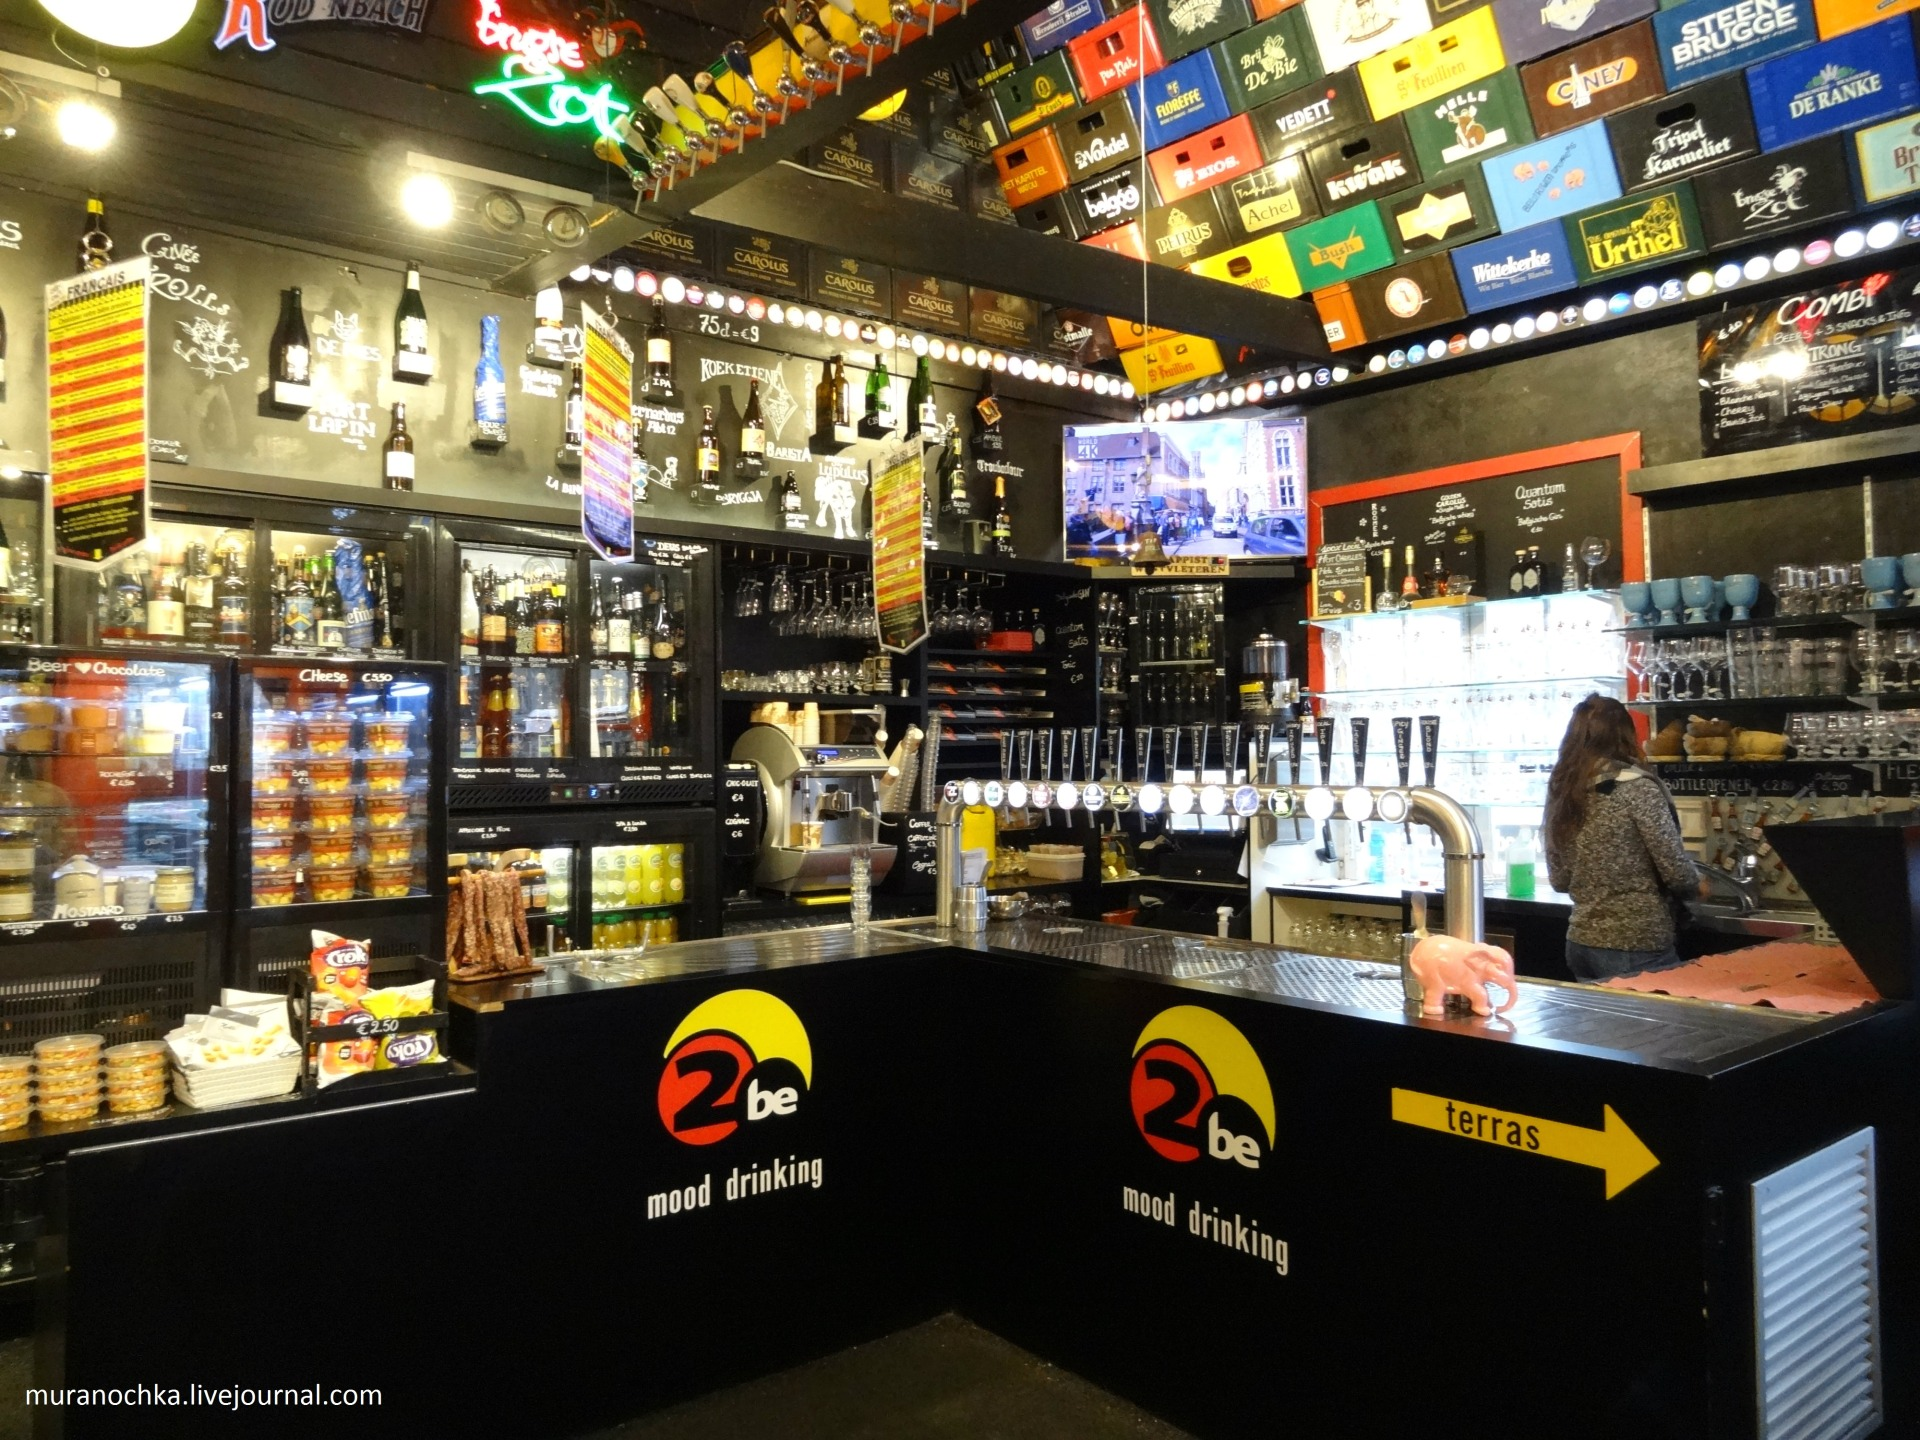 Популярный в Брюгге (Бельгия) бар The Beer Wall